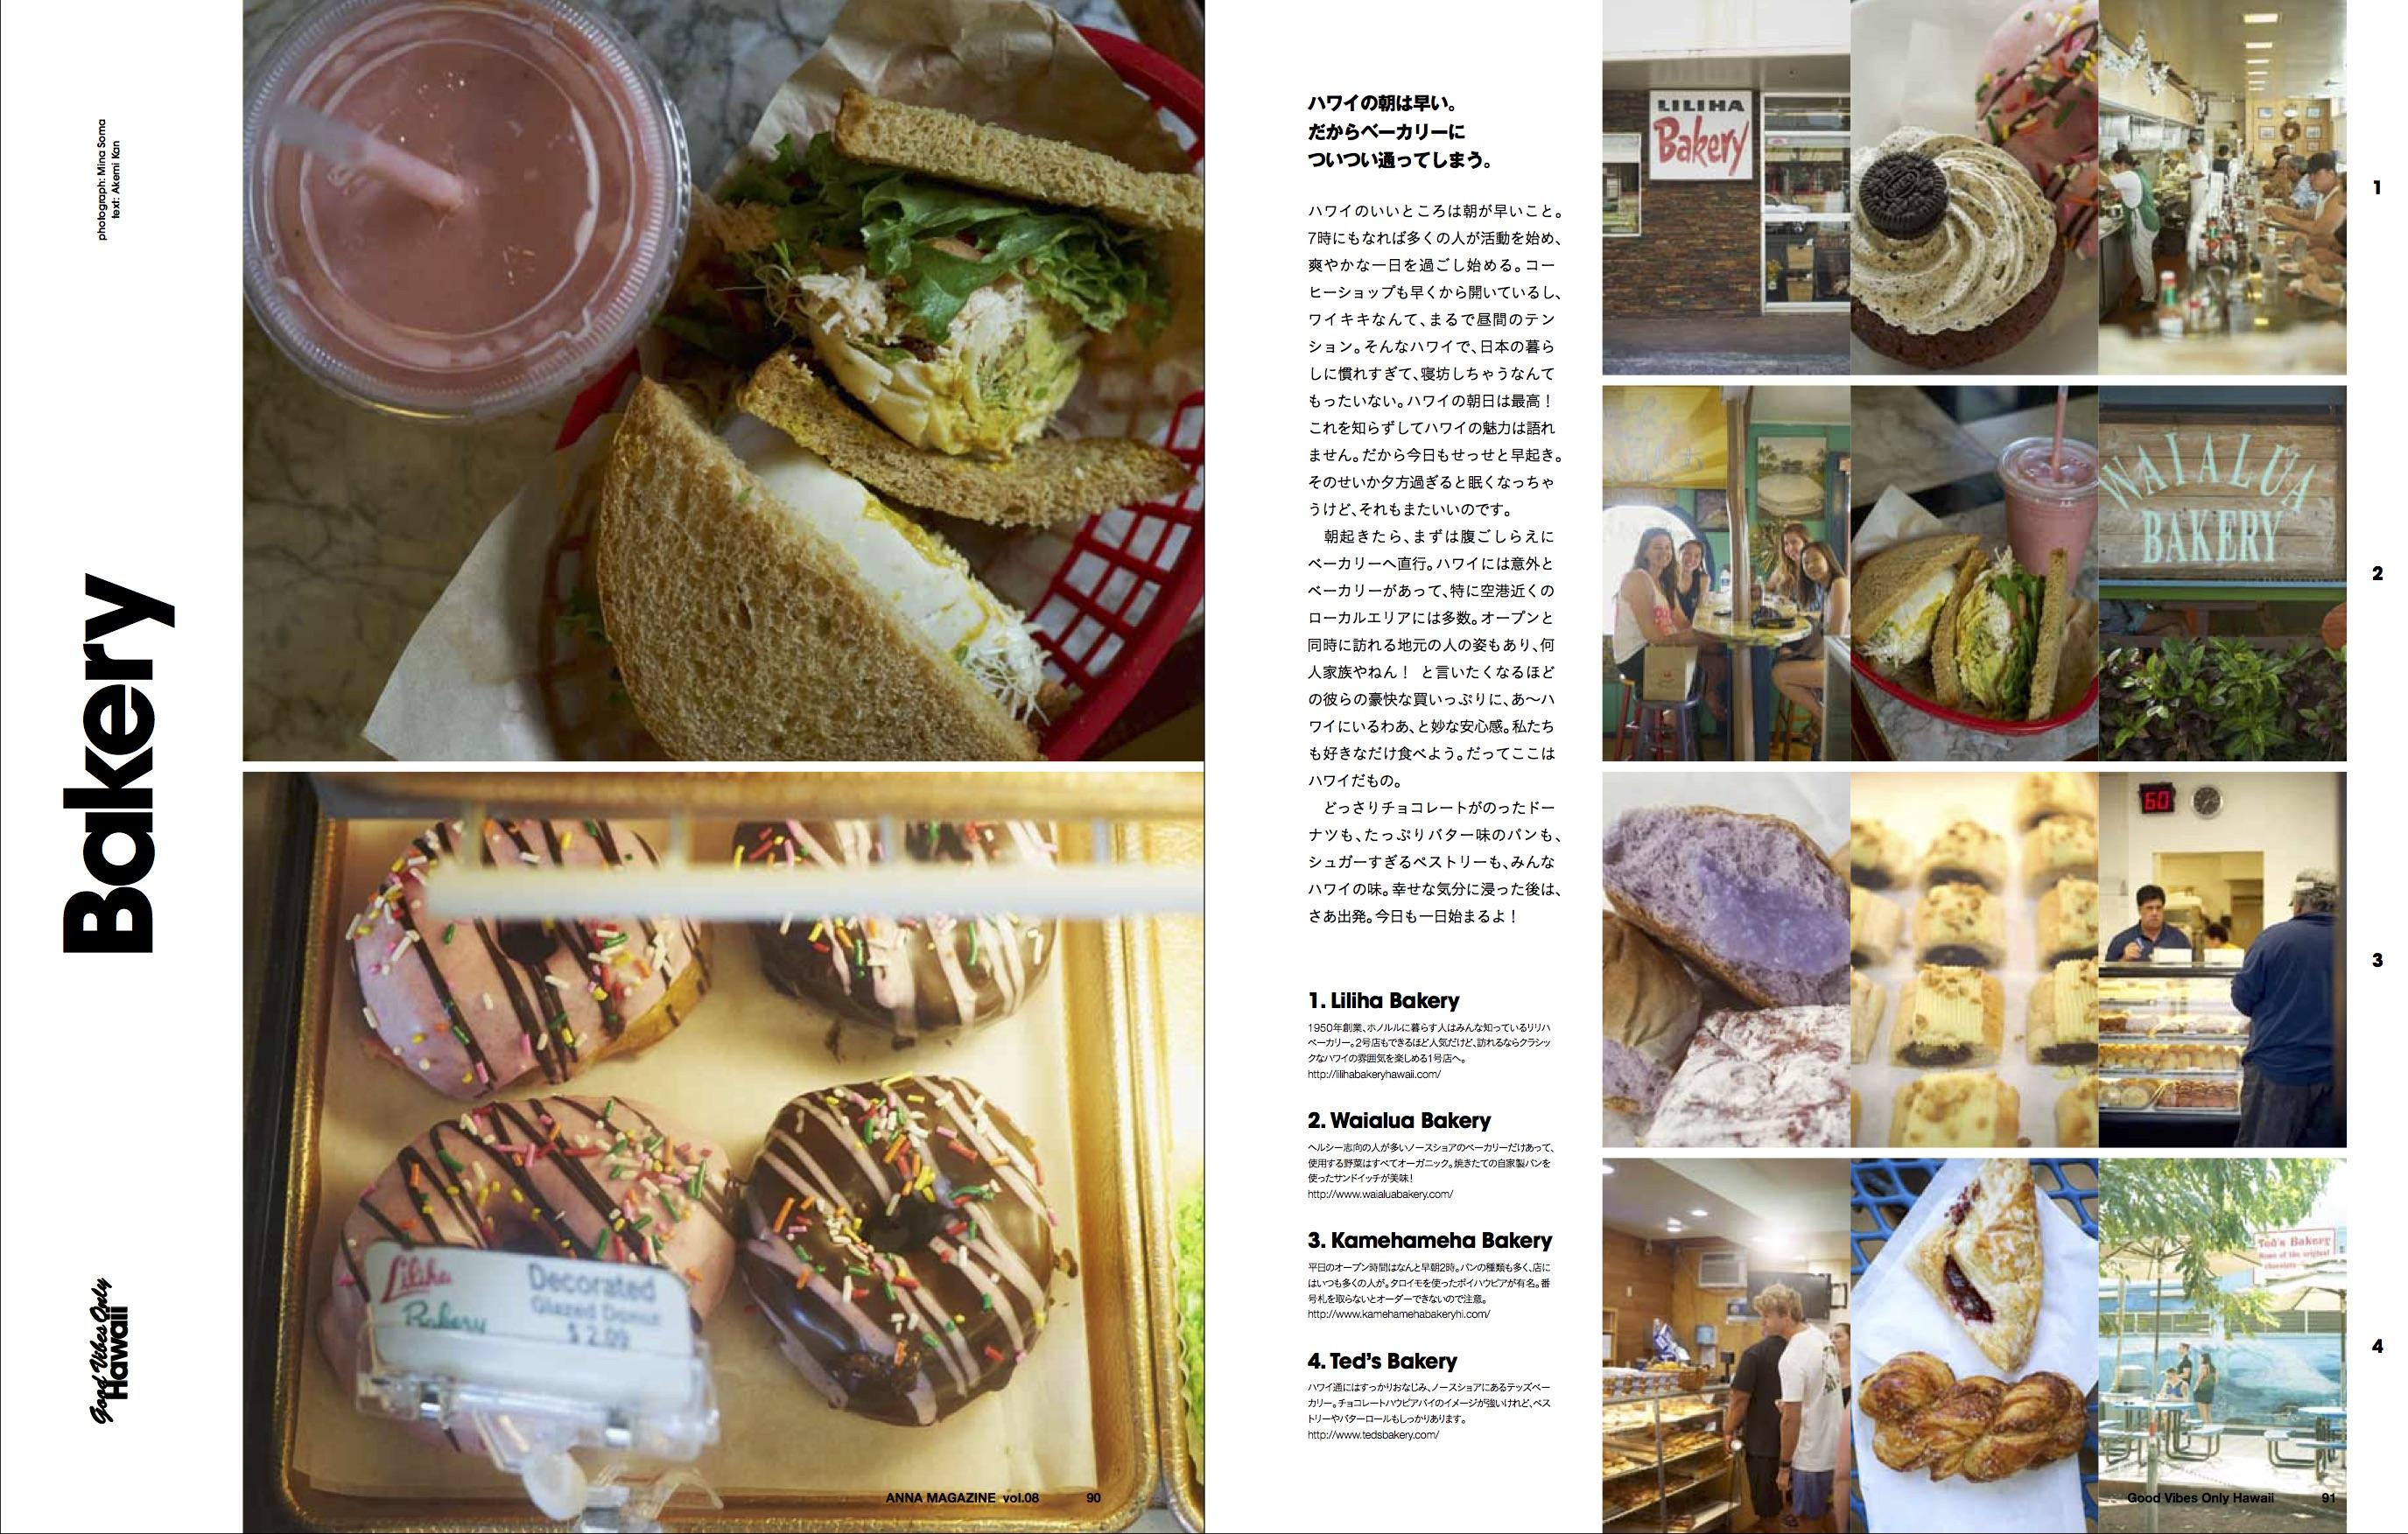 anna magazine vol.8 P43